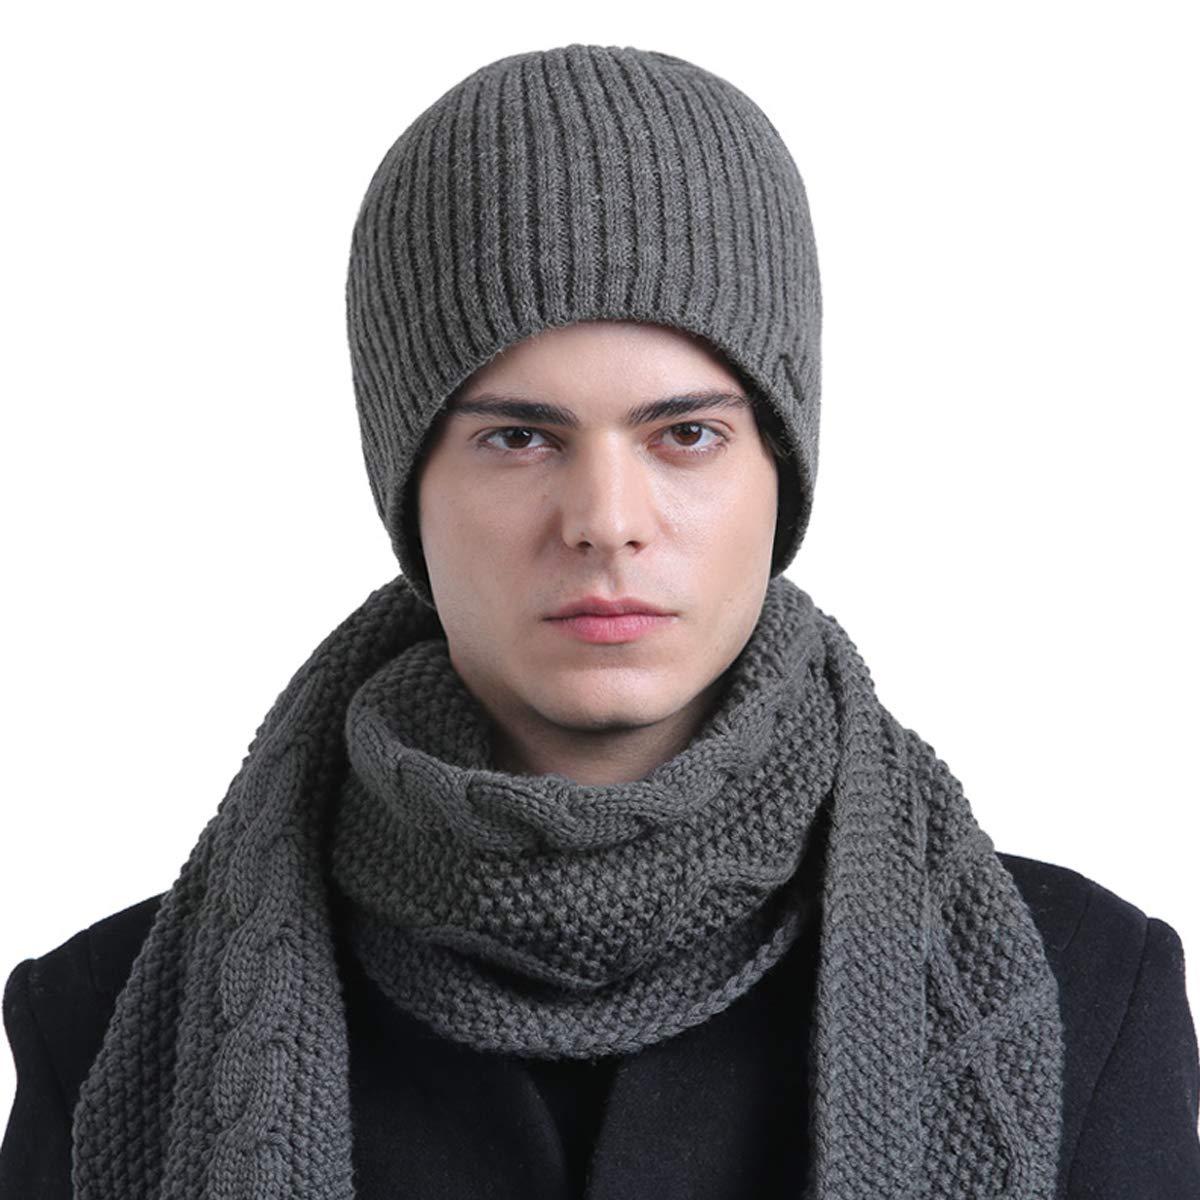 2e336f9ee485 CACUSS Mens Winter Wool Beanie Hat Warm Knit Hat Daily Cuff Beanie Thick  Ski Caps Comfy Skull Cap (Gray)